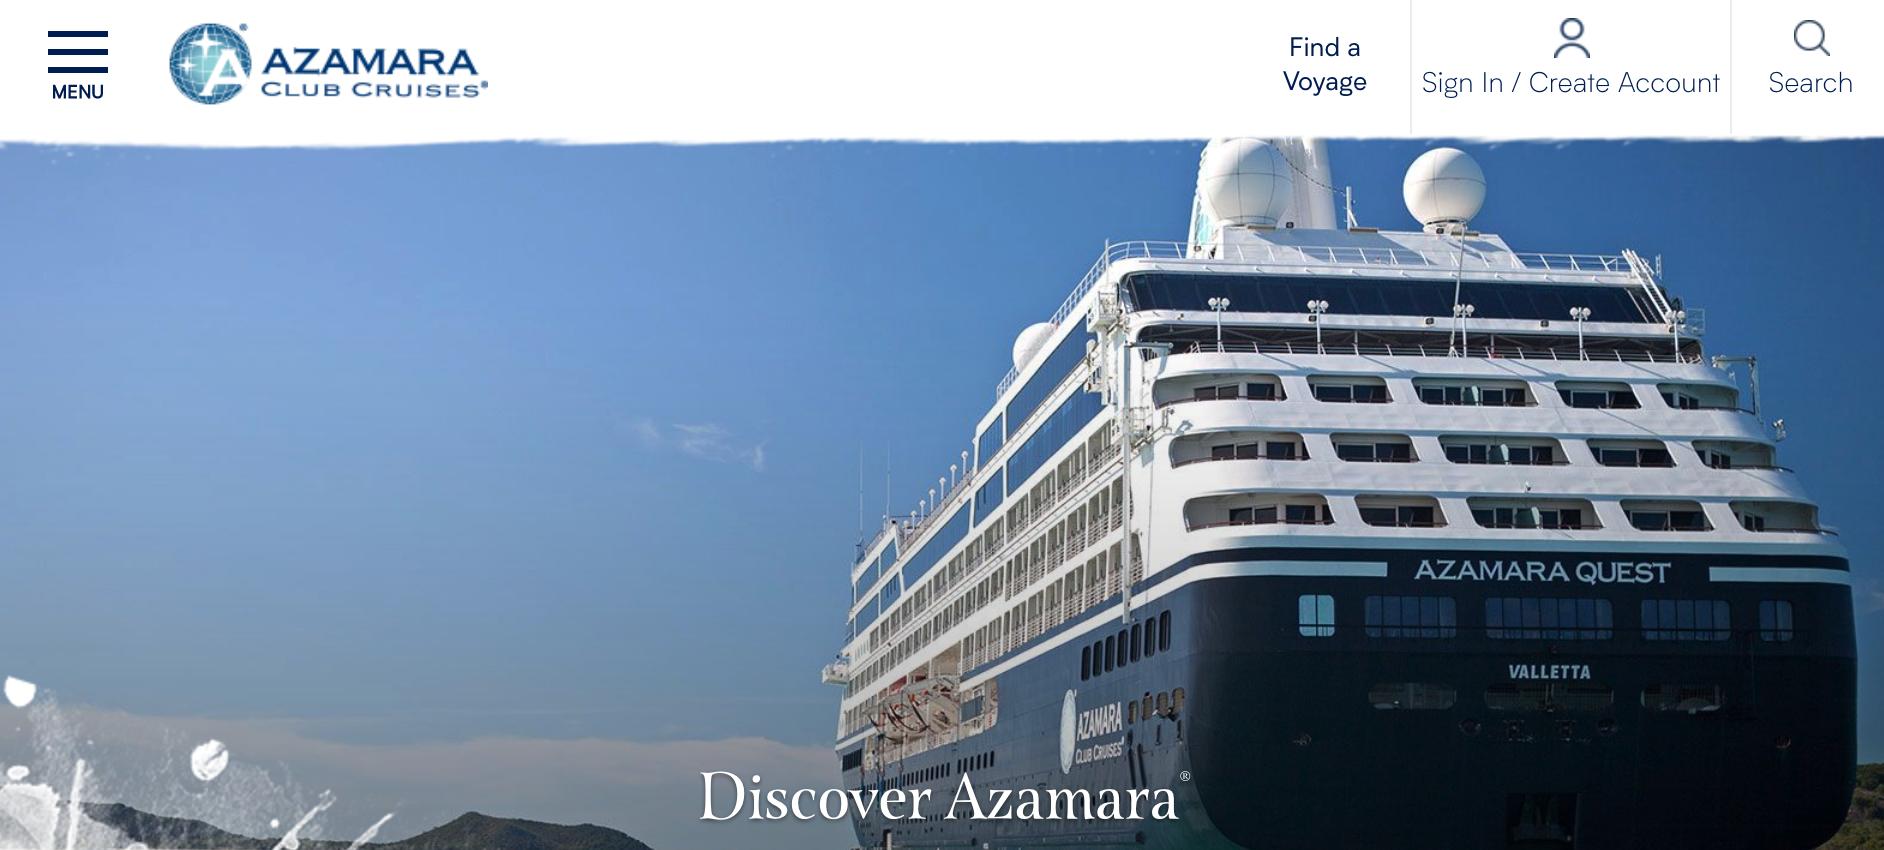 Azamara-Cruise-Insurance | AardvarkCompare.com